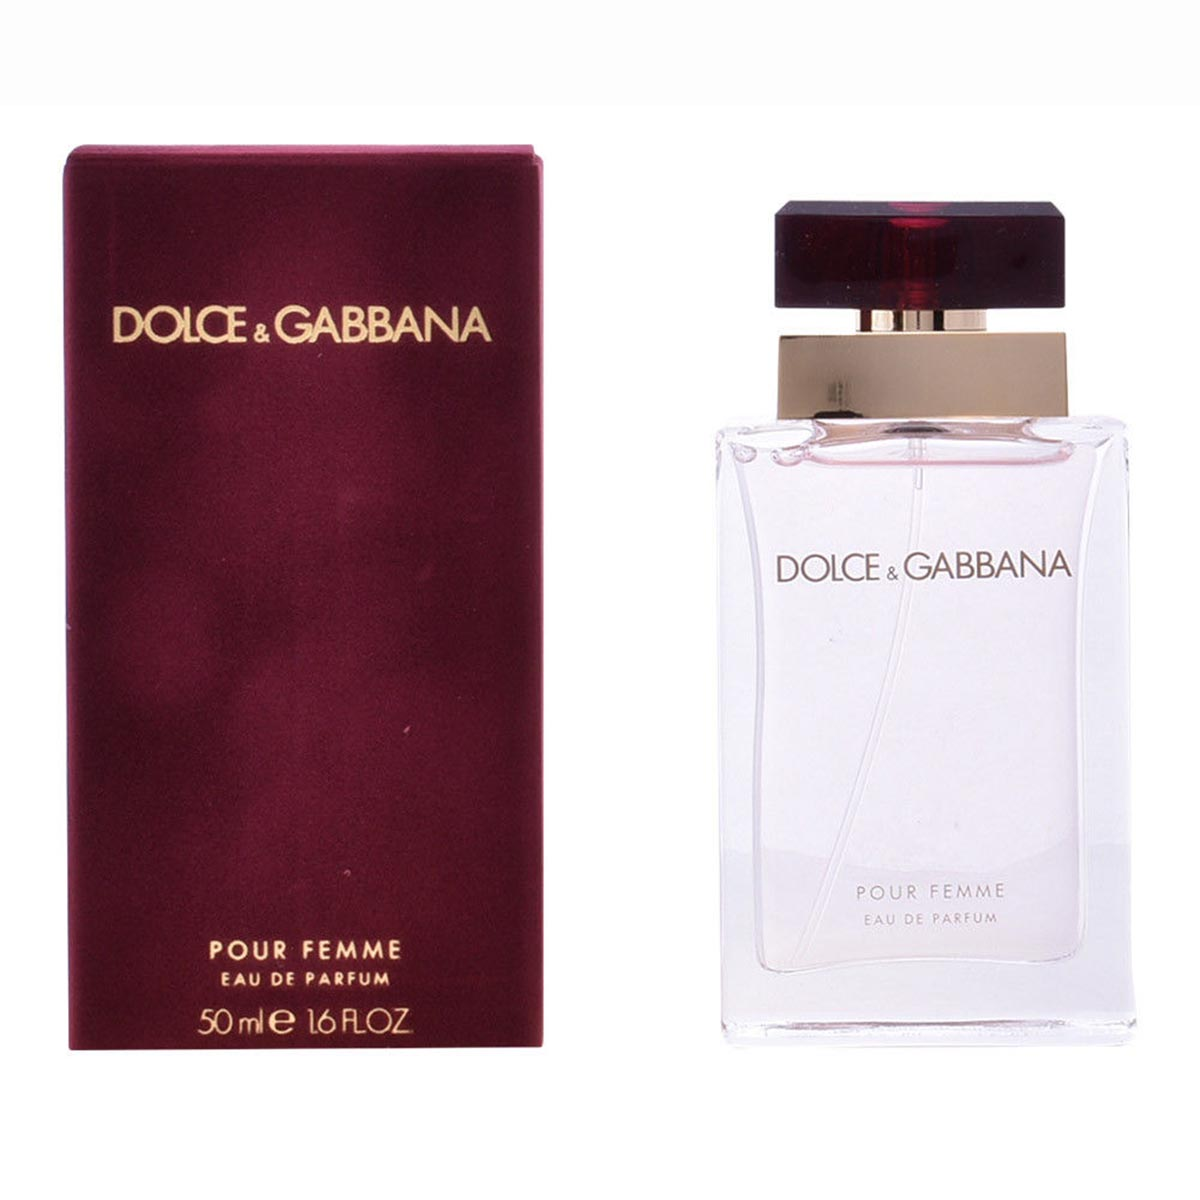 Dolce gabbana dolce gabbana pour femme eau de parfum 50ml vaporizador